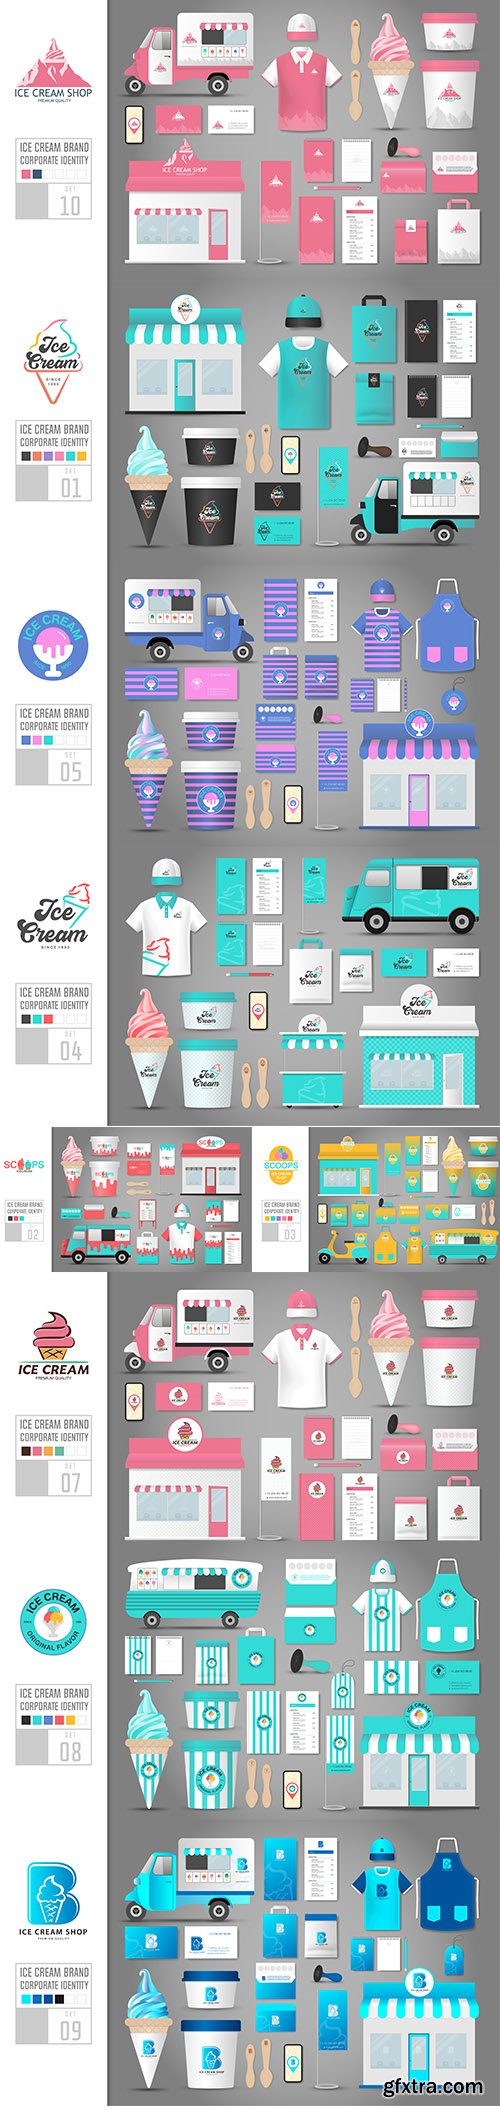 Corporate Identity Template Ice Cream Shop Vector Set